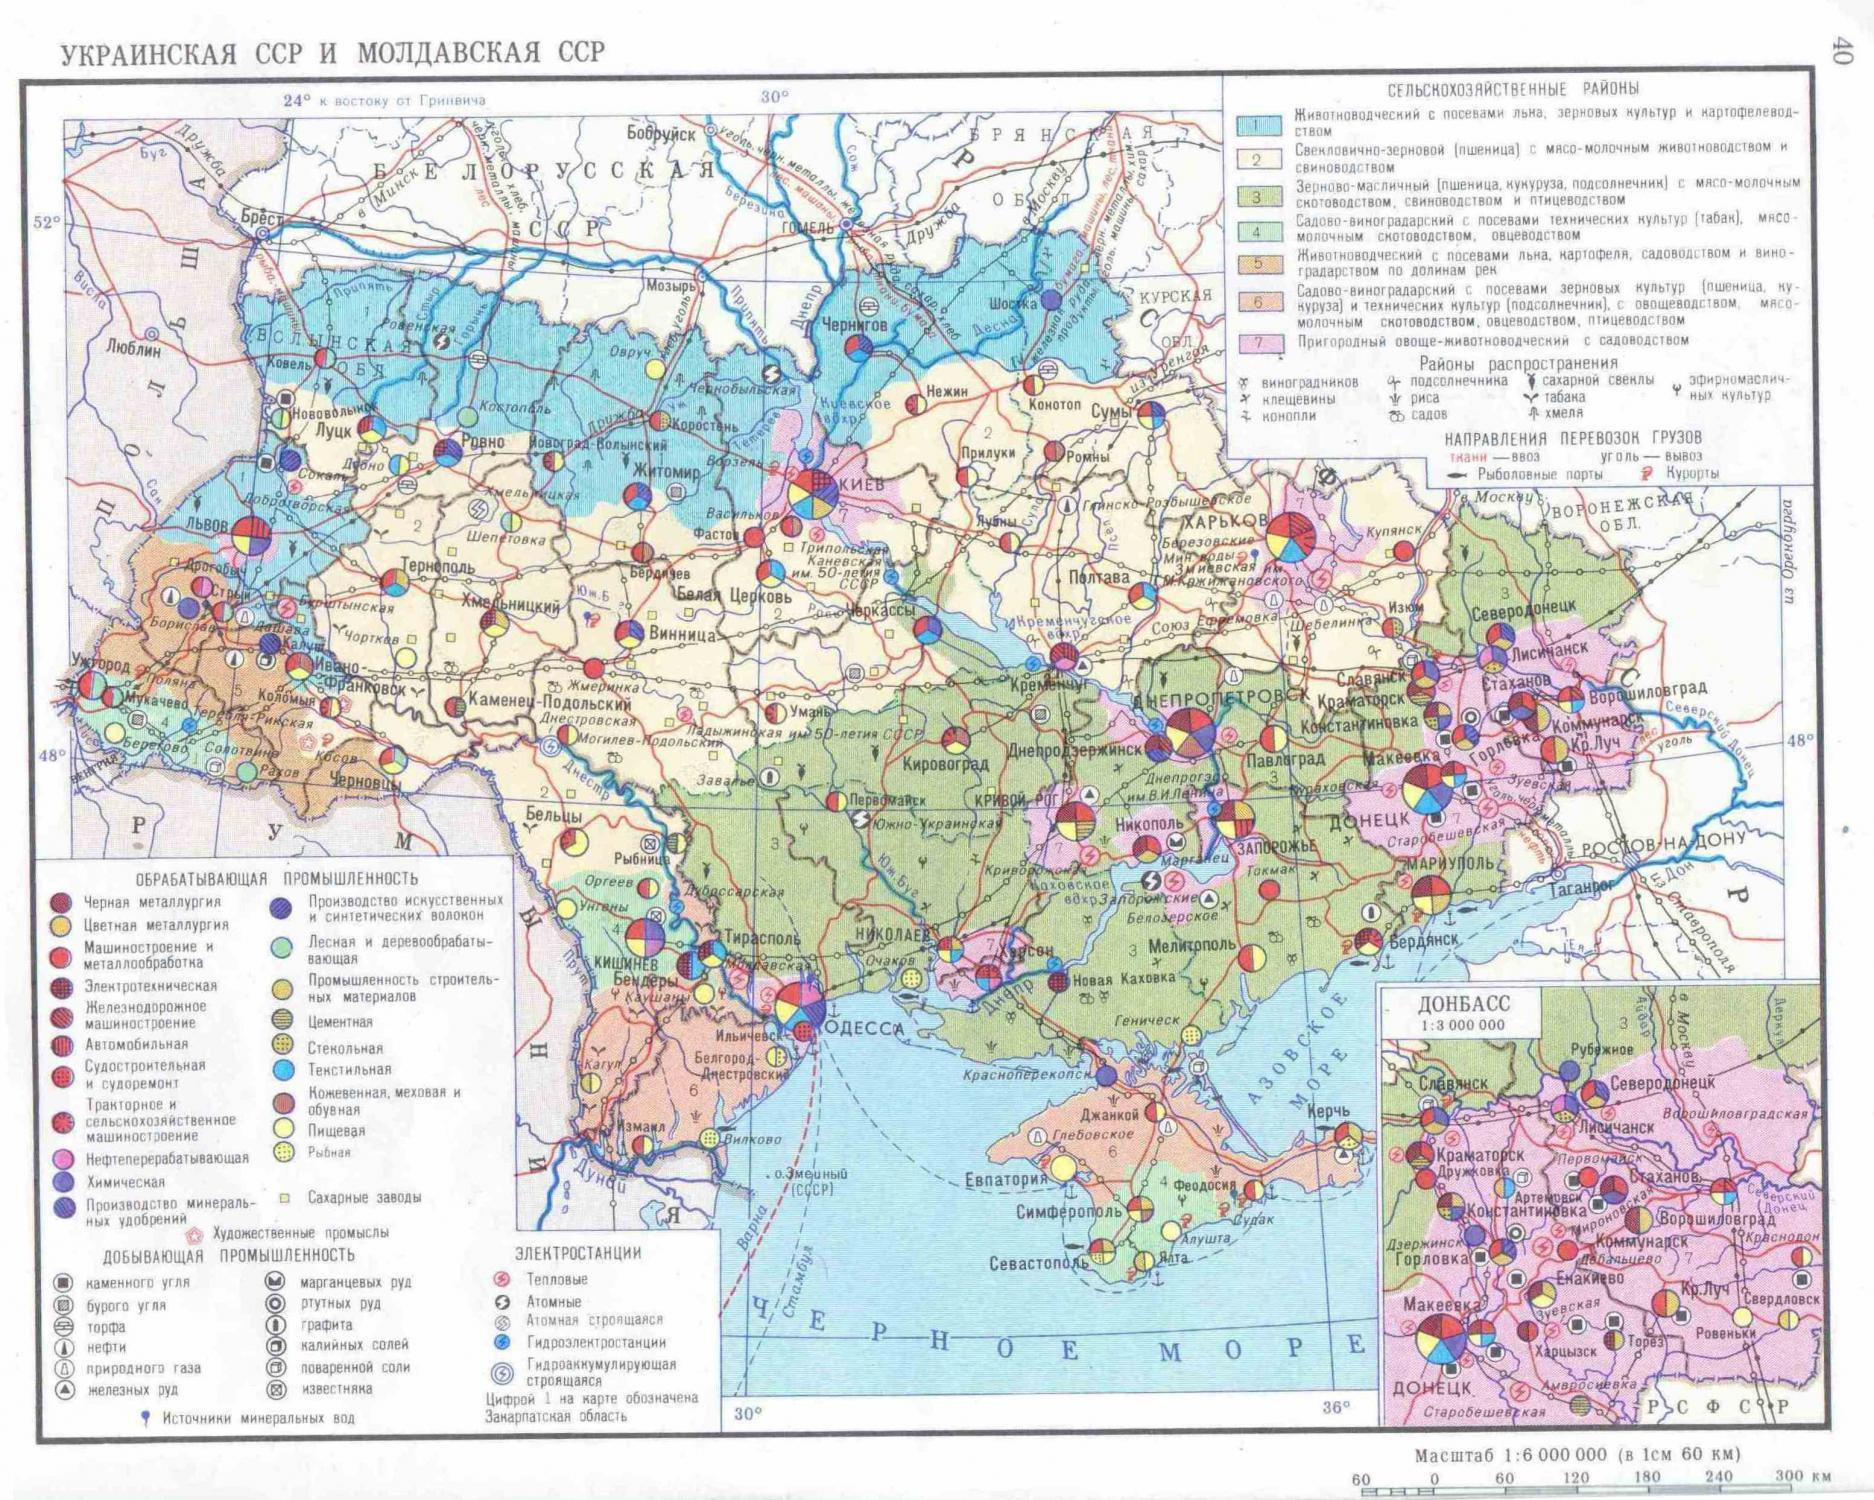 Молдавия и МССР (bazil)